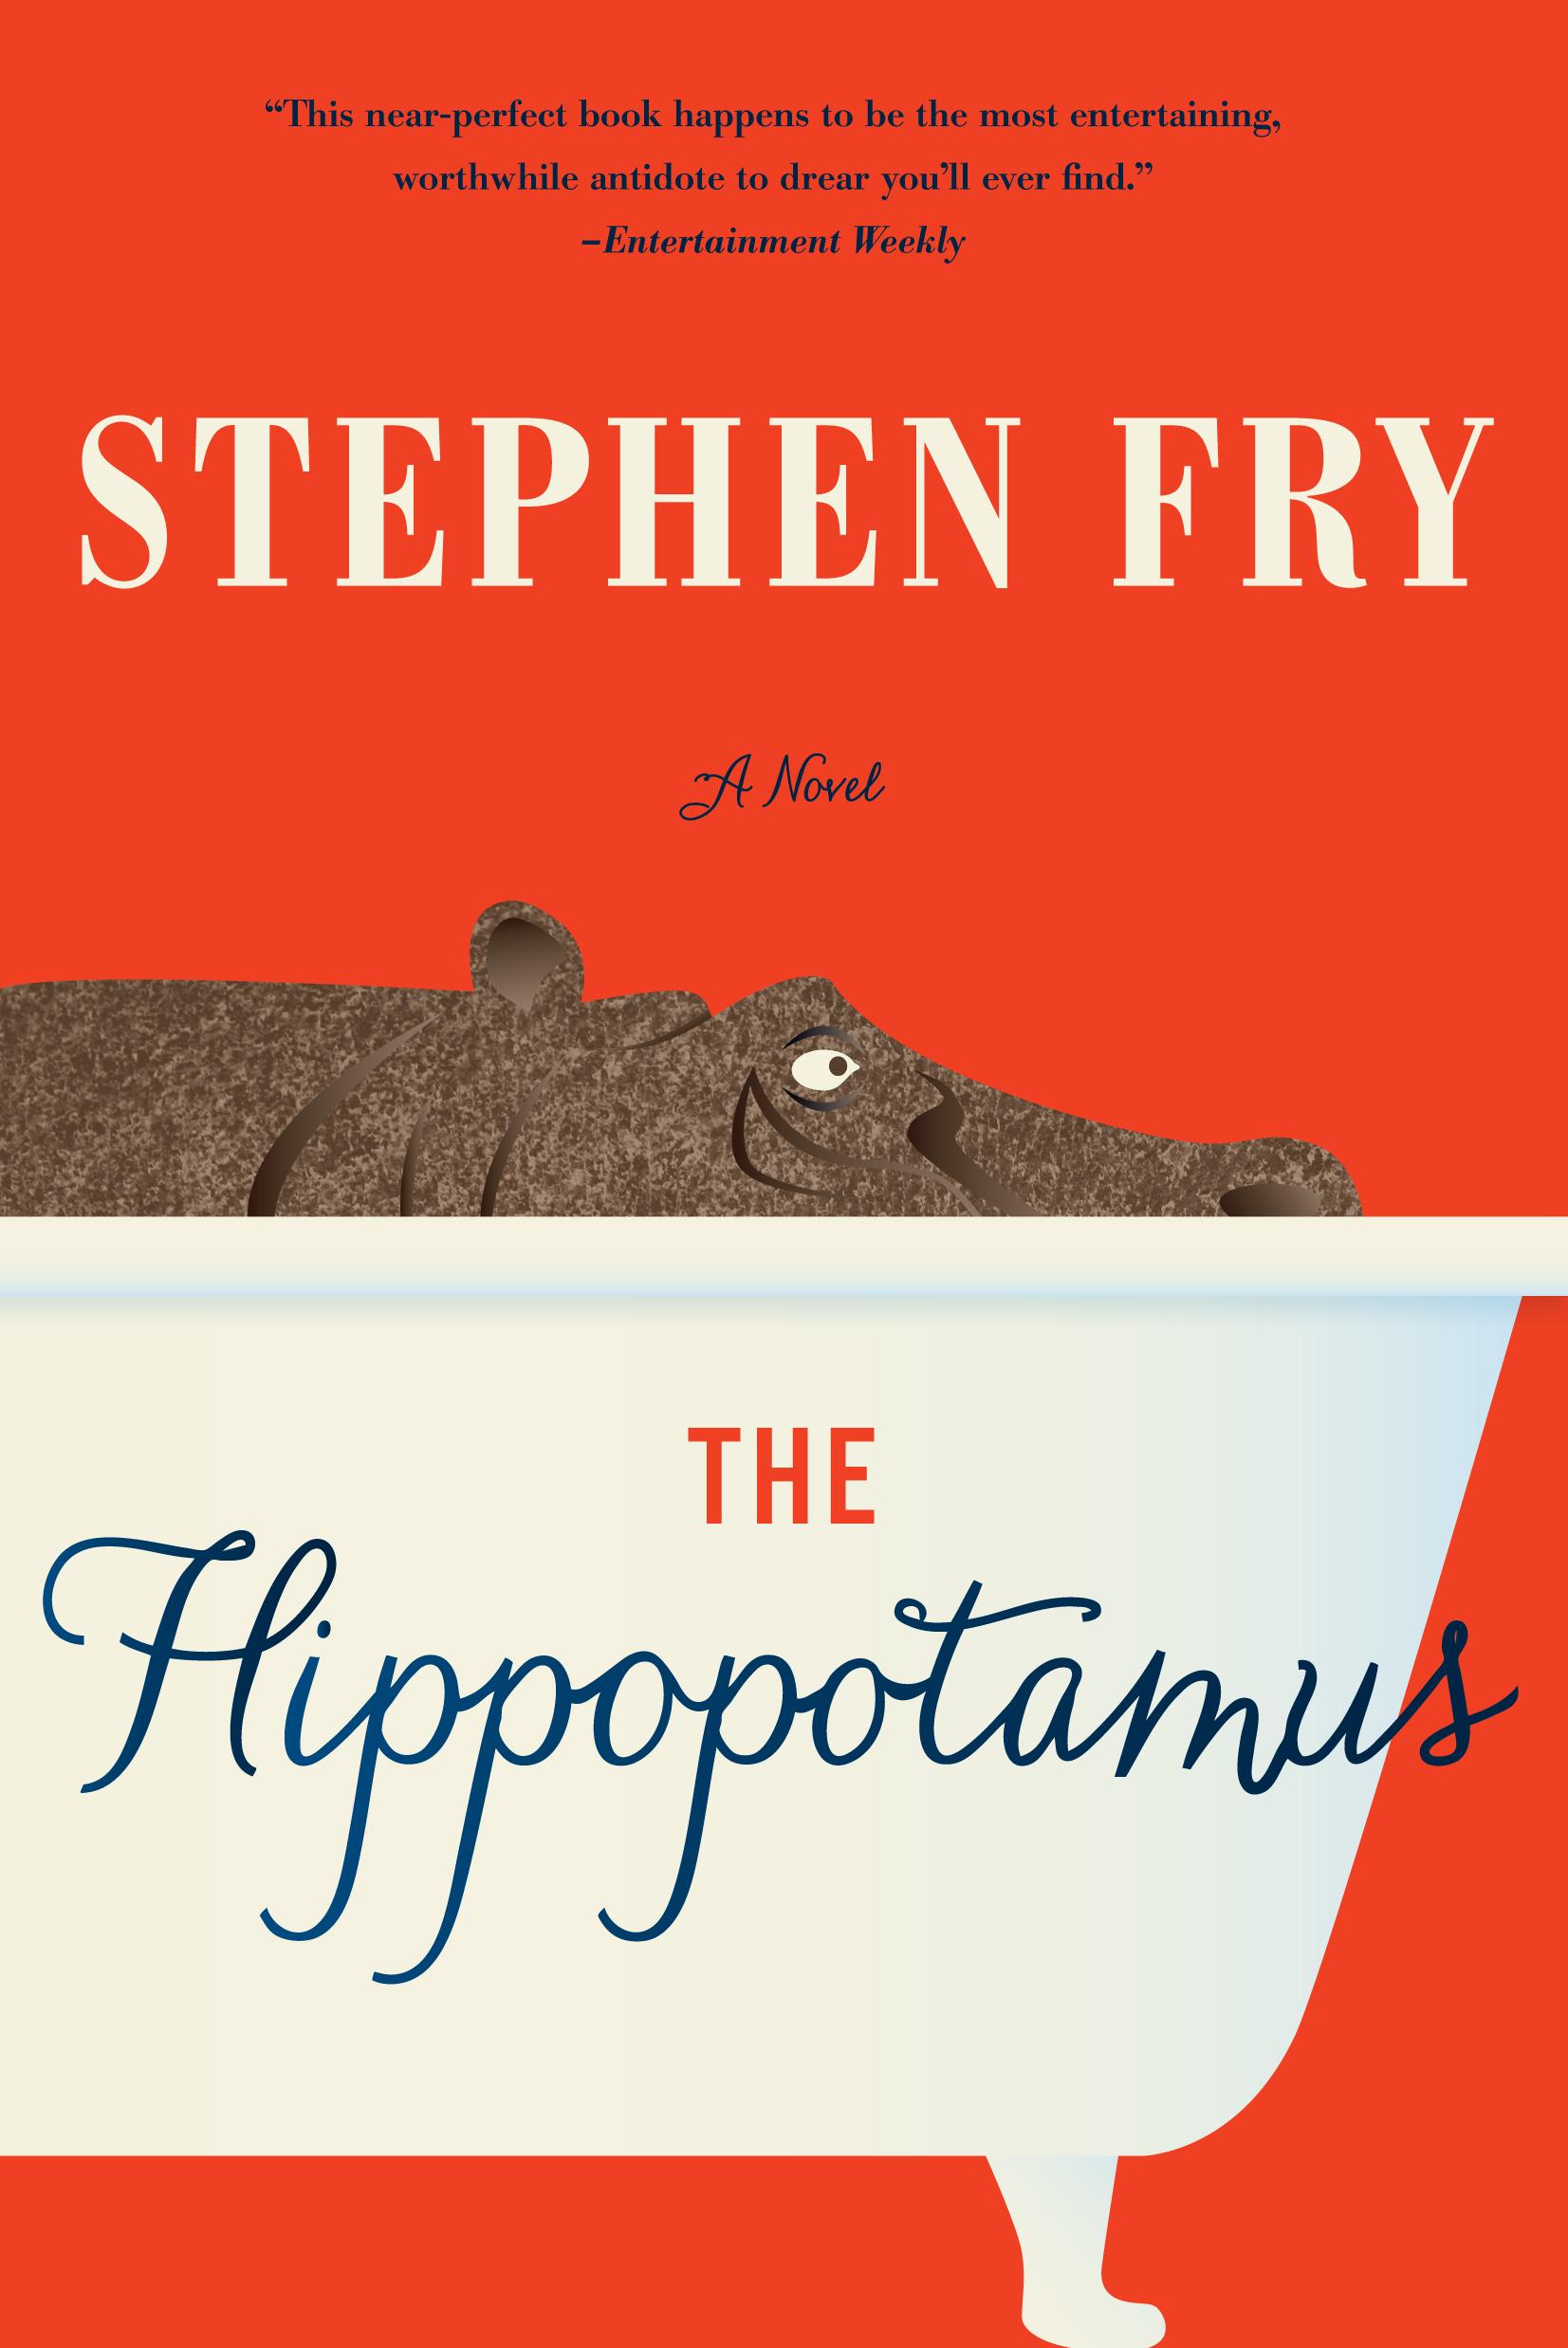 kgd_Fry_Hippopotamus copy.jpg